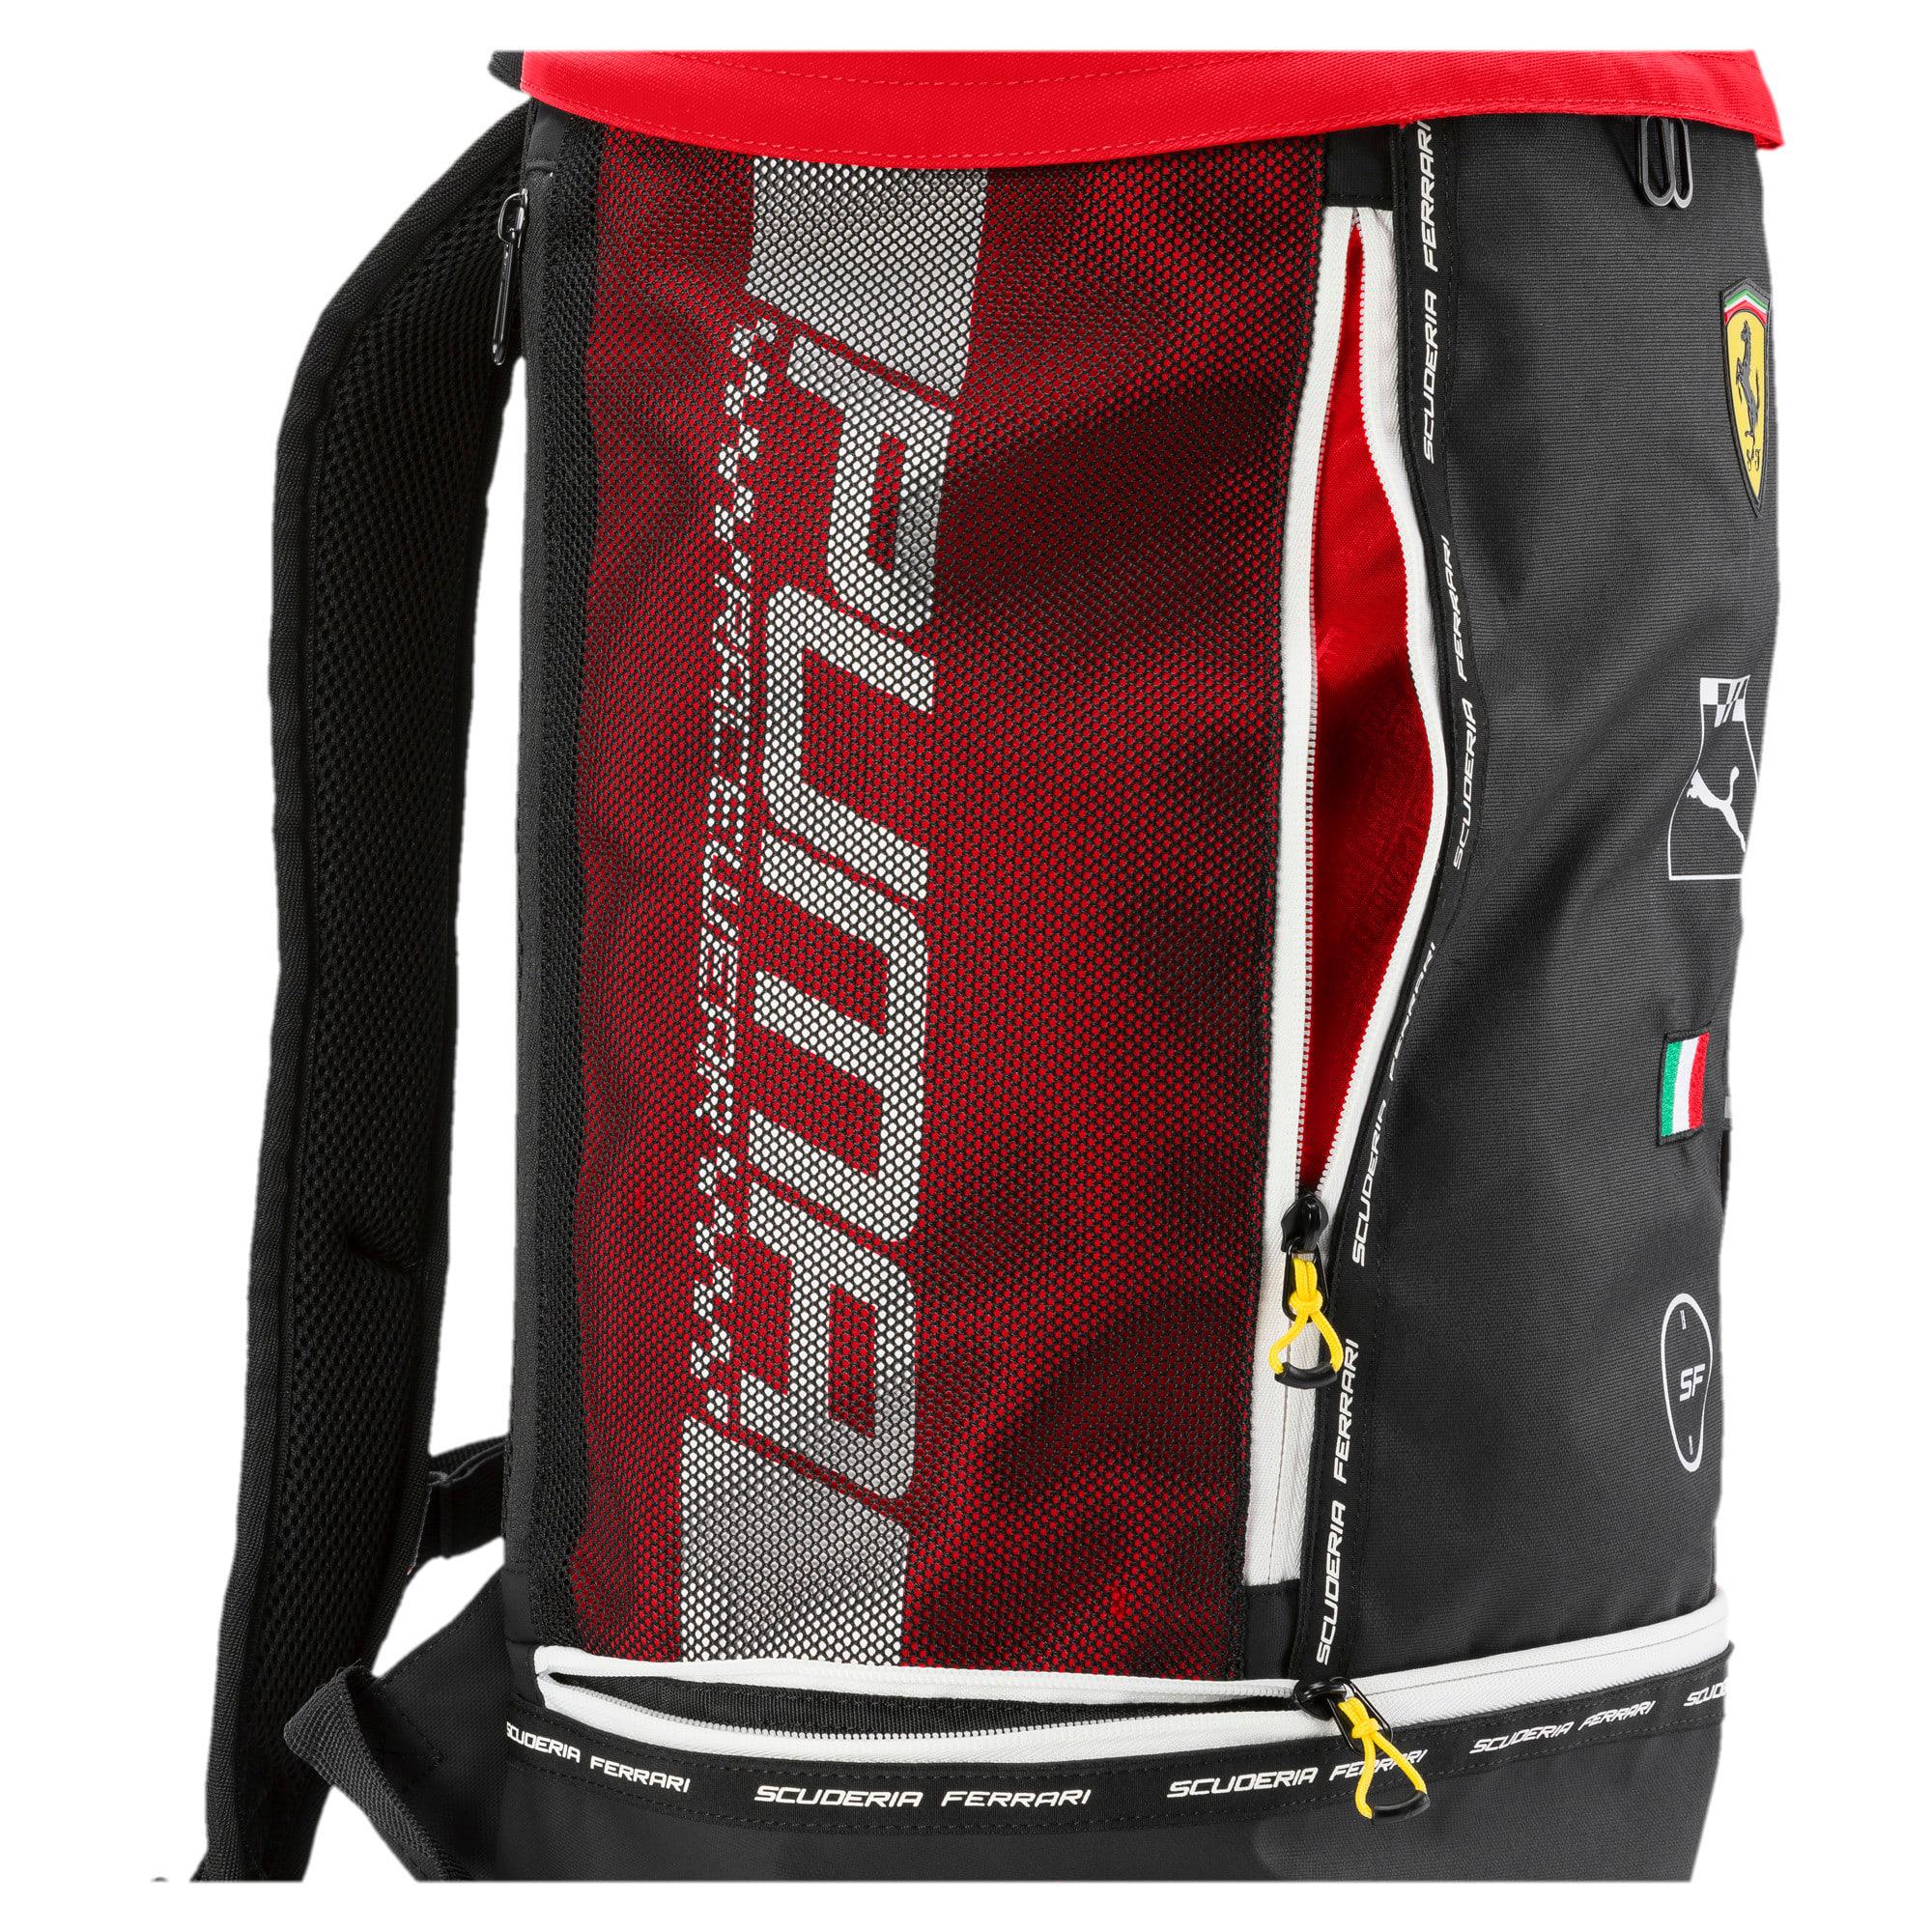 Thumbnail 4 of Ferrari Fanwear RCT Backpack, Rosso Corsa, medium-IND